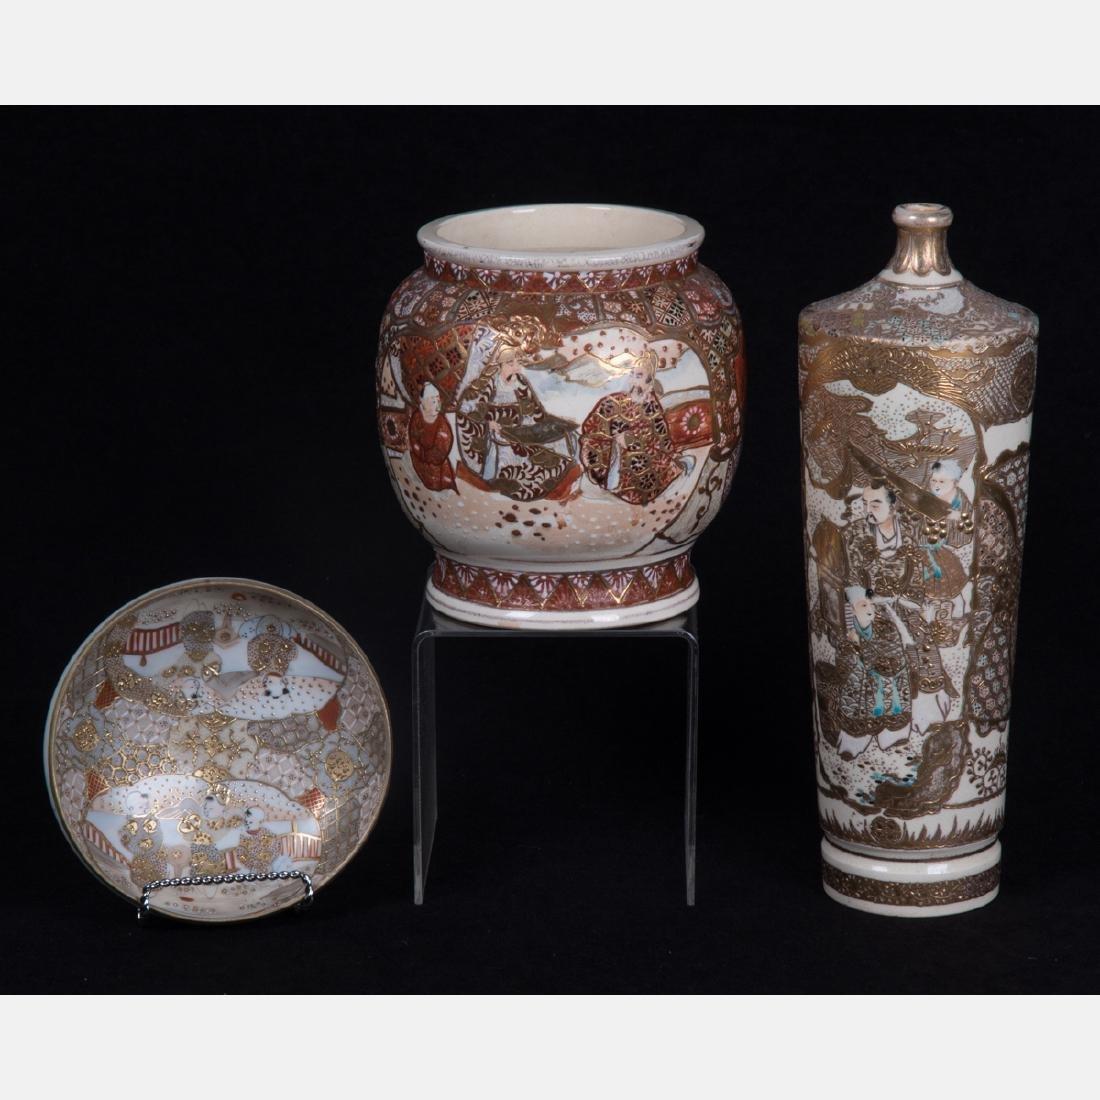 A Group of Three Japanese Satsuma Porcelain and